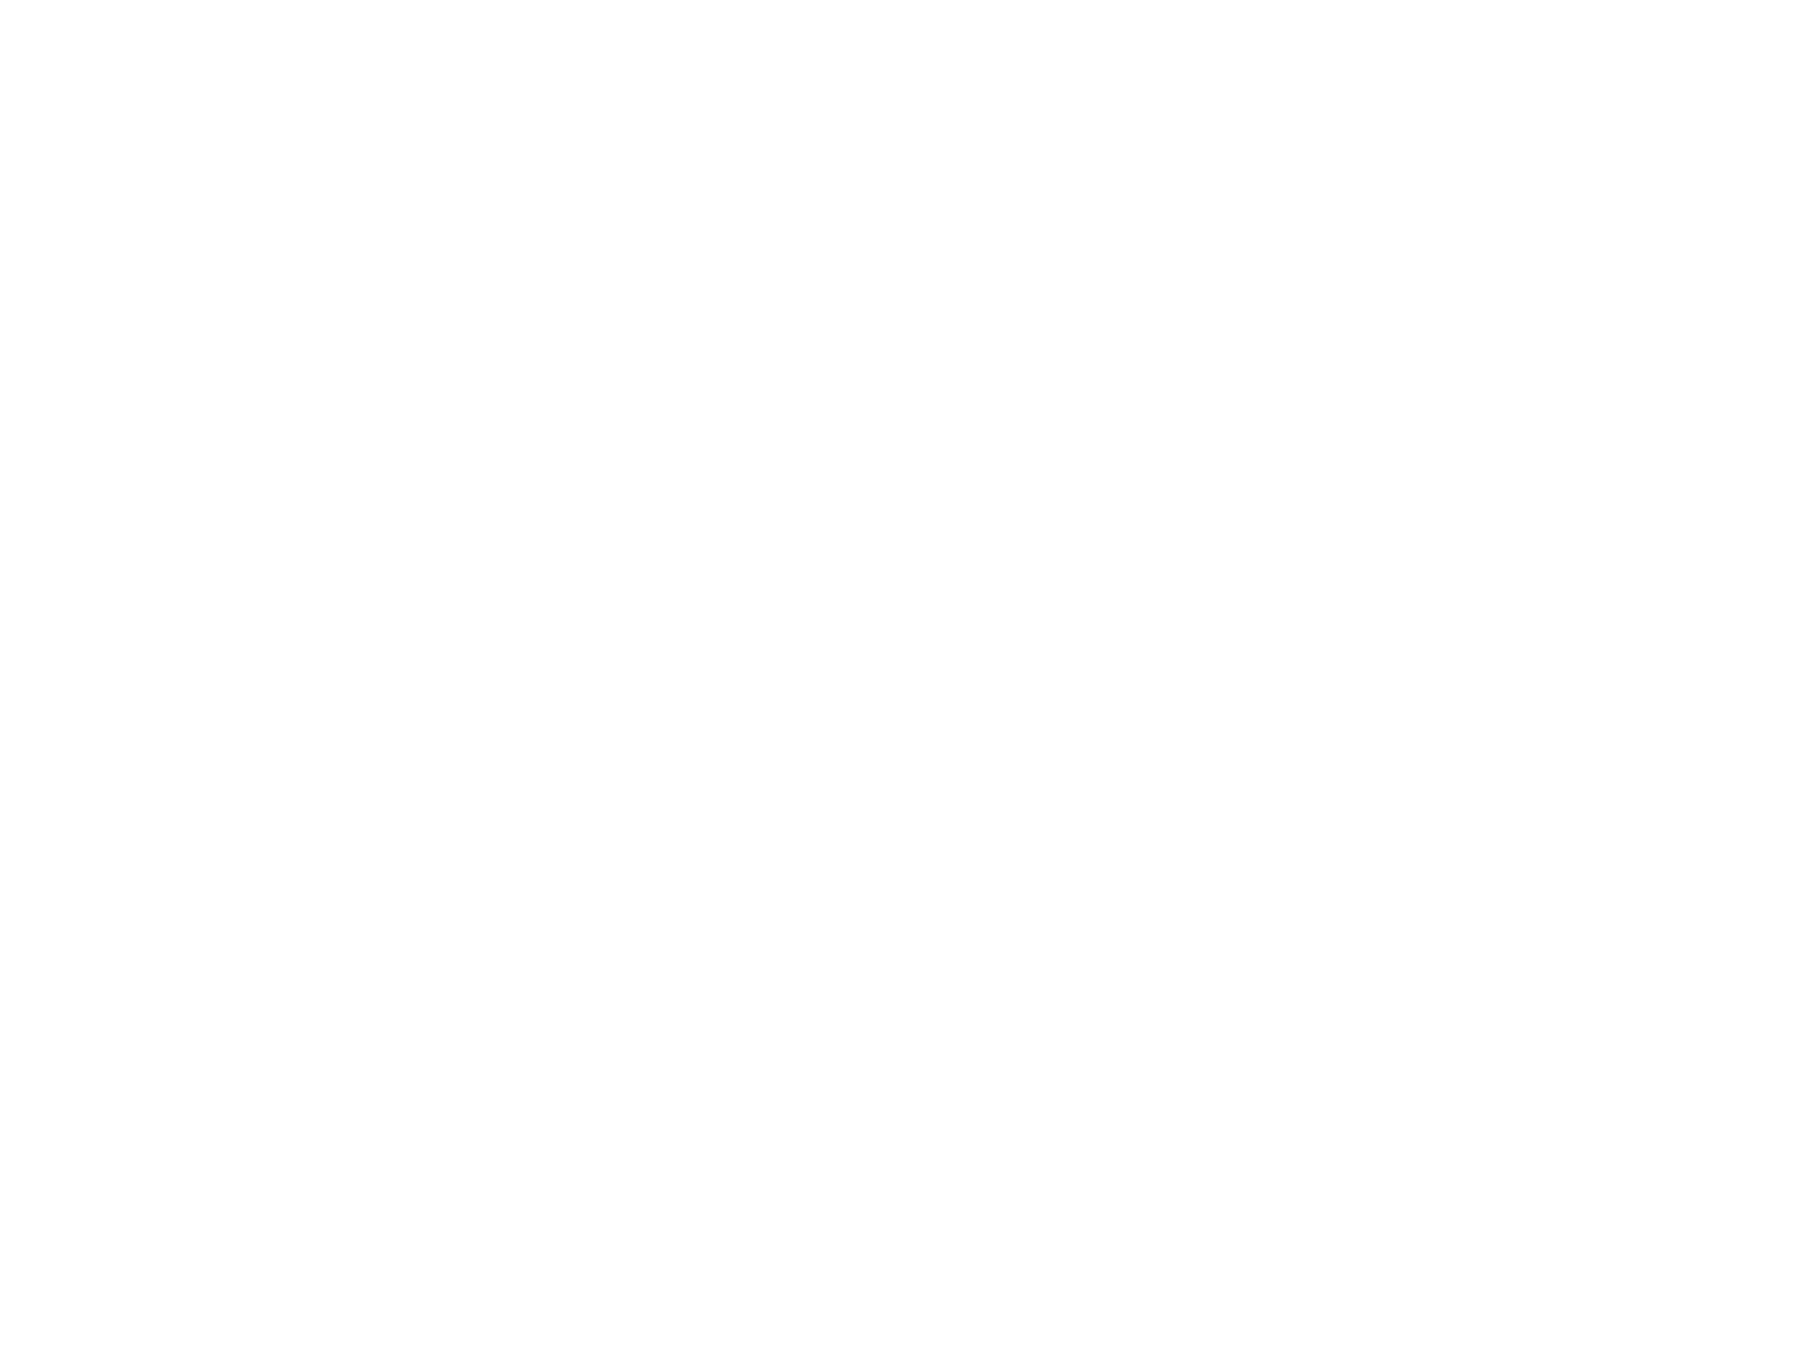 Stiftung Anscharhöhe